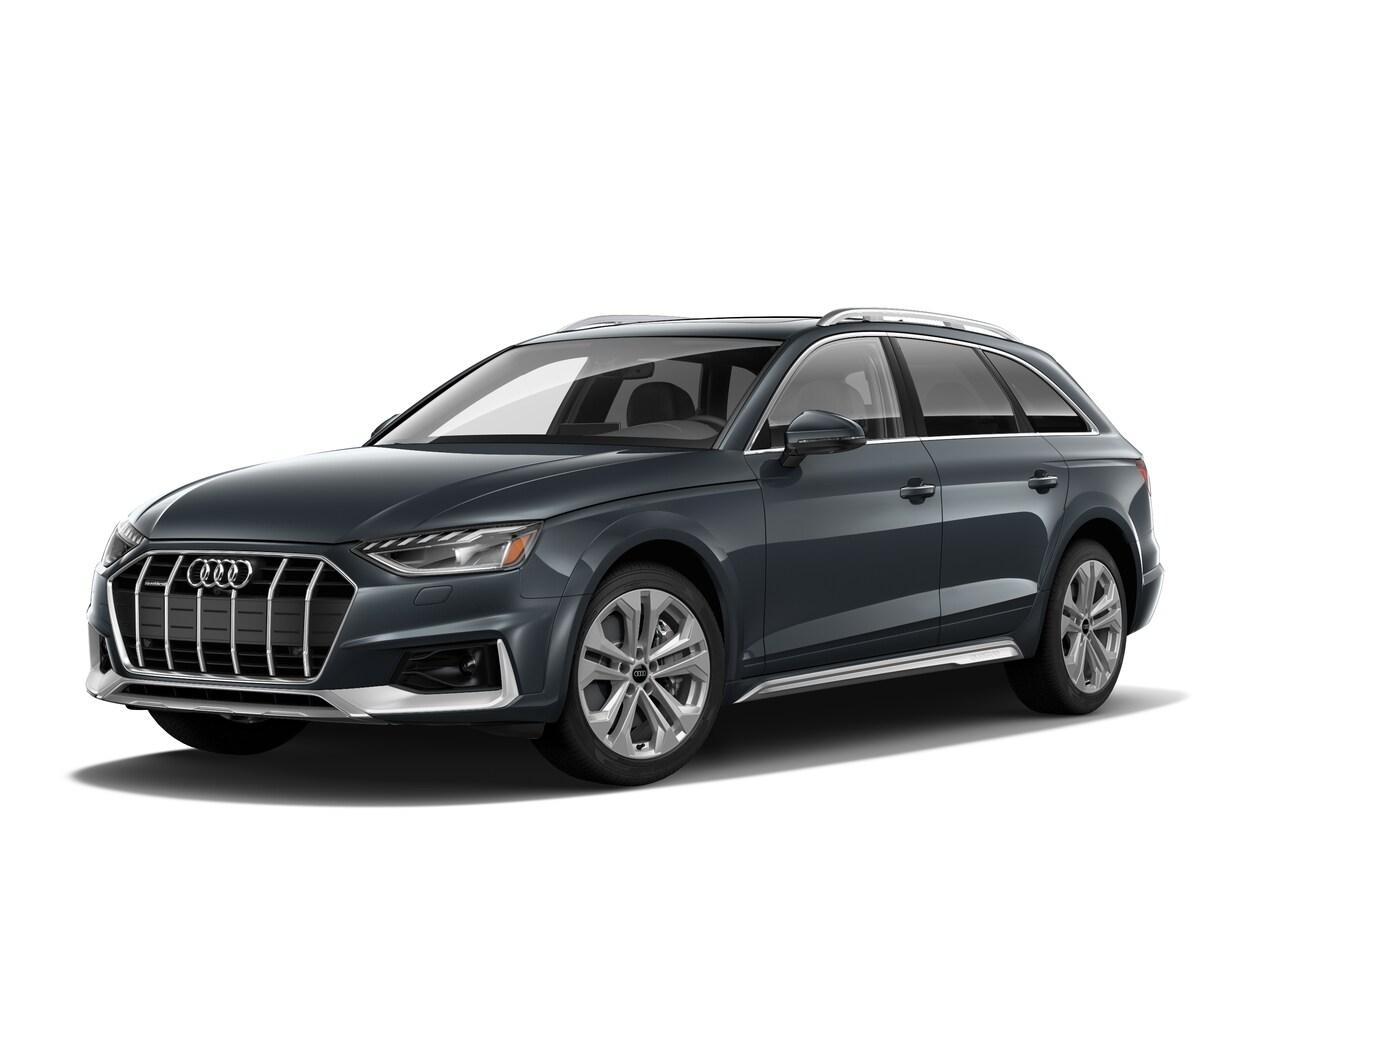 2021 Audi A4 Allroad For Sale In Beaverton Or Audi Beaverton